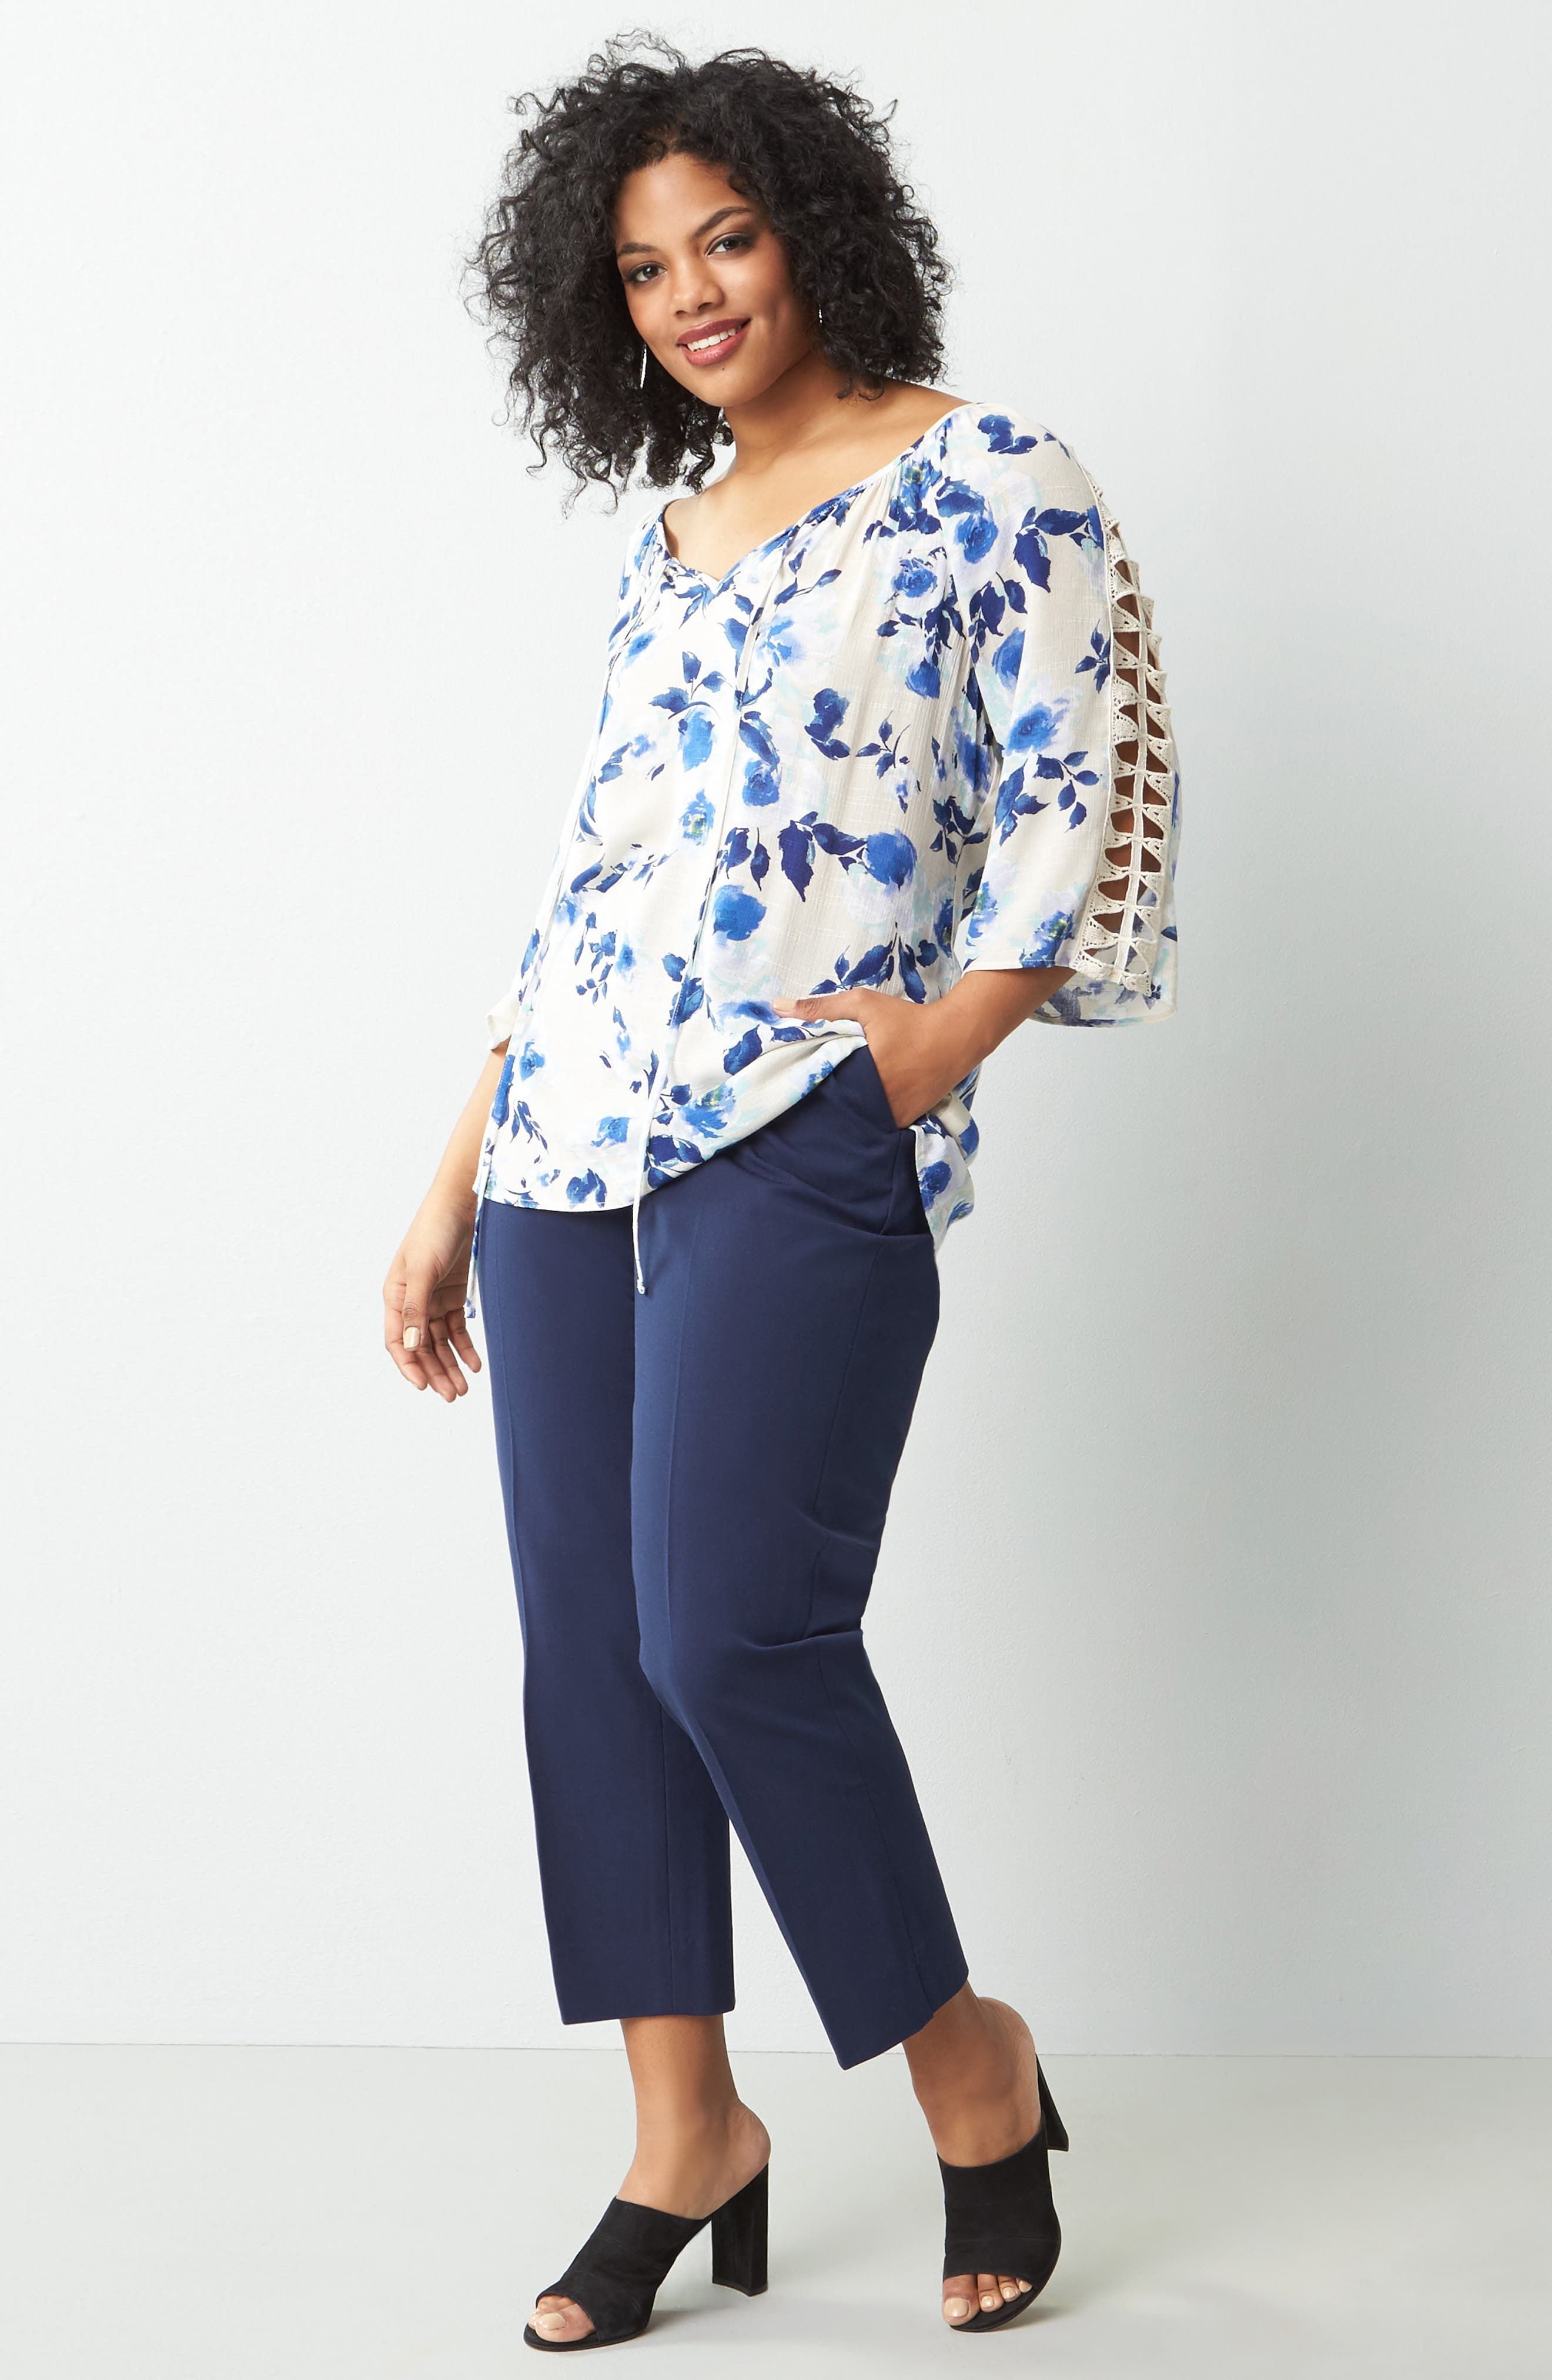 Bobeau Top & Sejour Pants Outfit with Accessories (Plus Size)